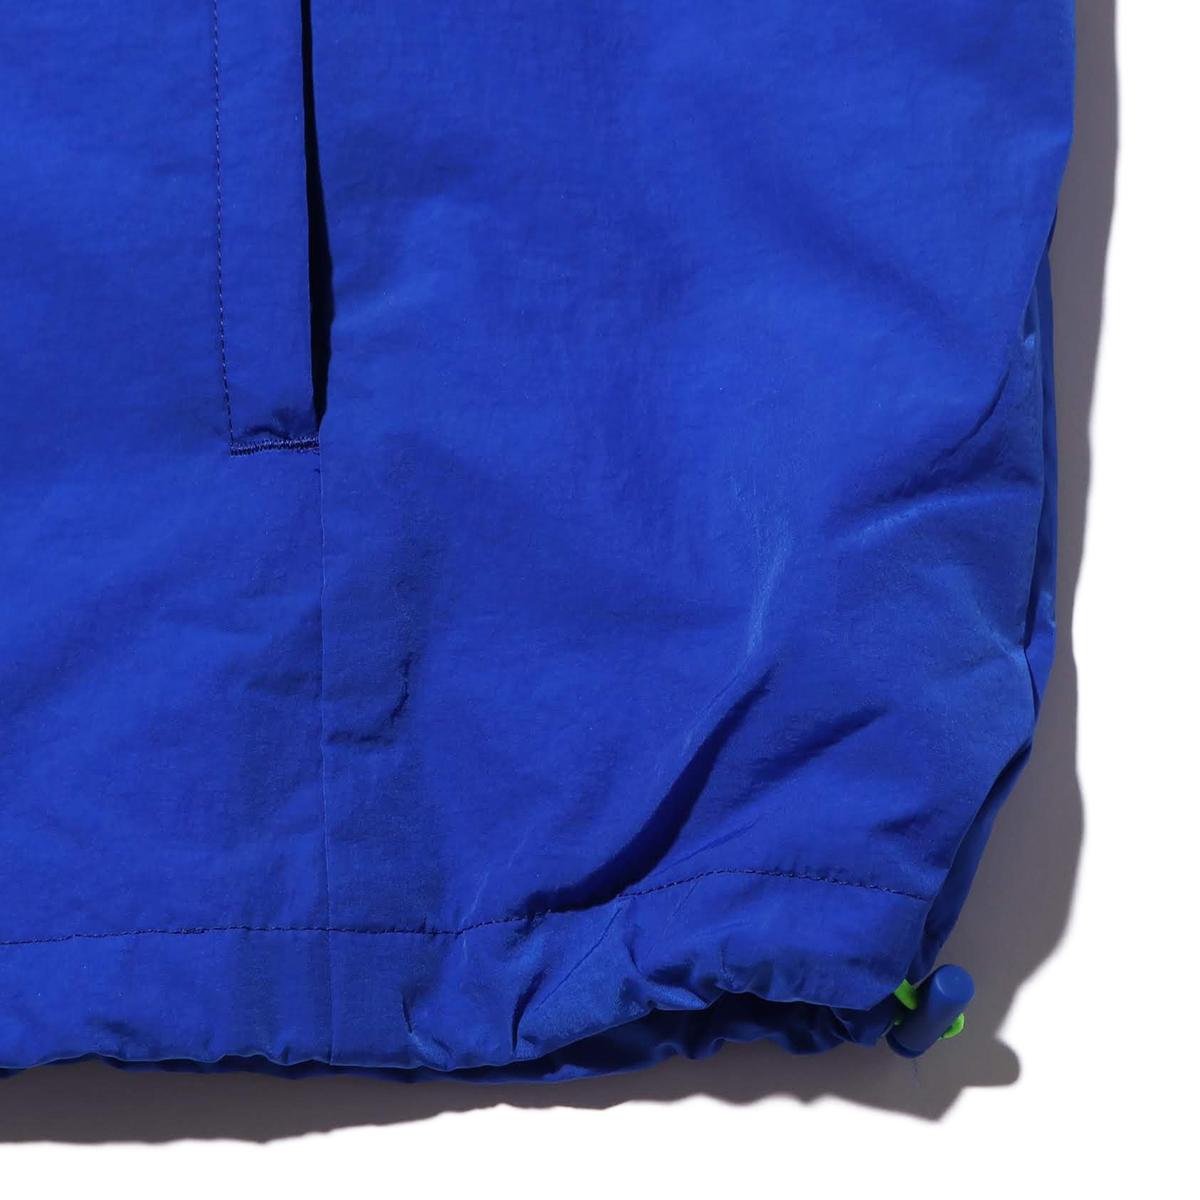 846fd09dce99 PUMA 90S RETRO WOVEN JACKET (SURF THE WEB) (Puma 90S nostalgic Woo a jacket)